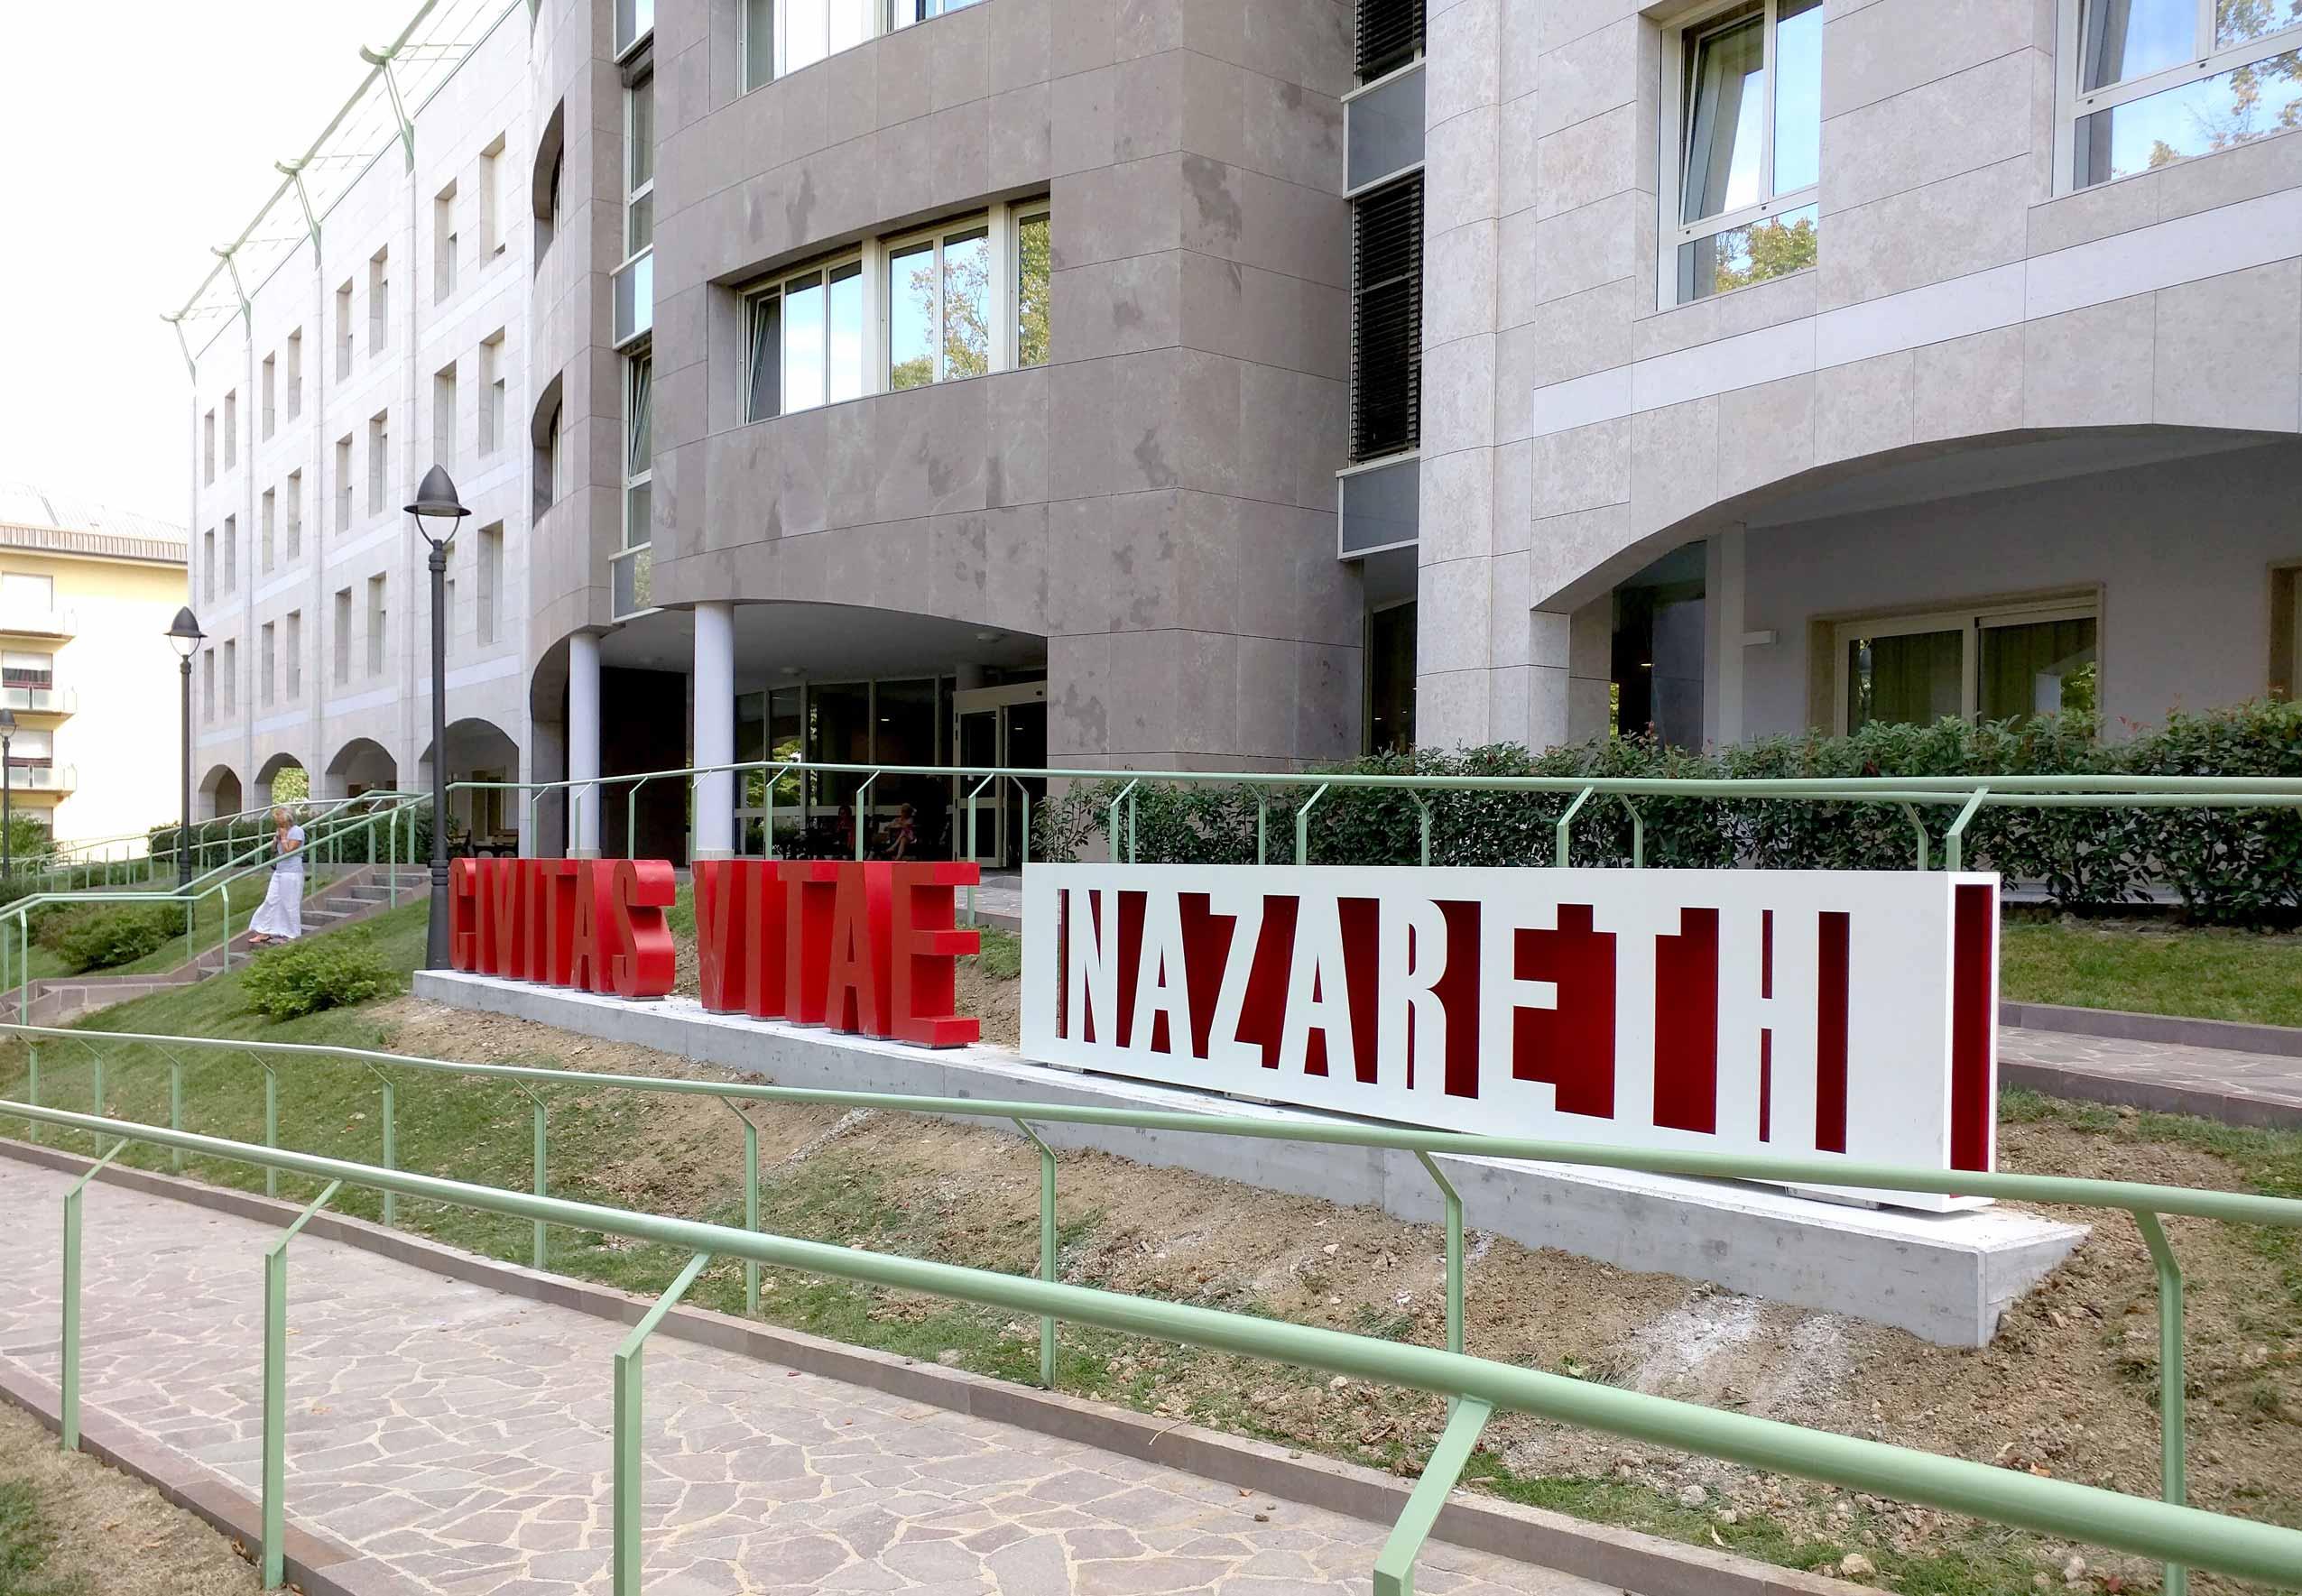 Nazareth_14